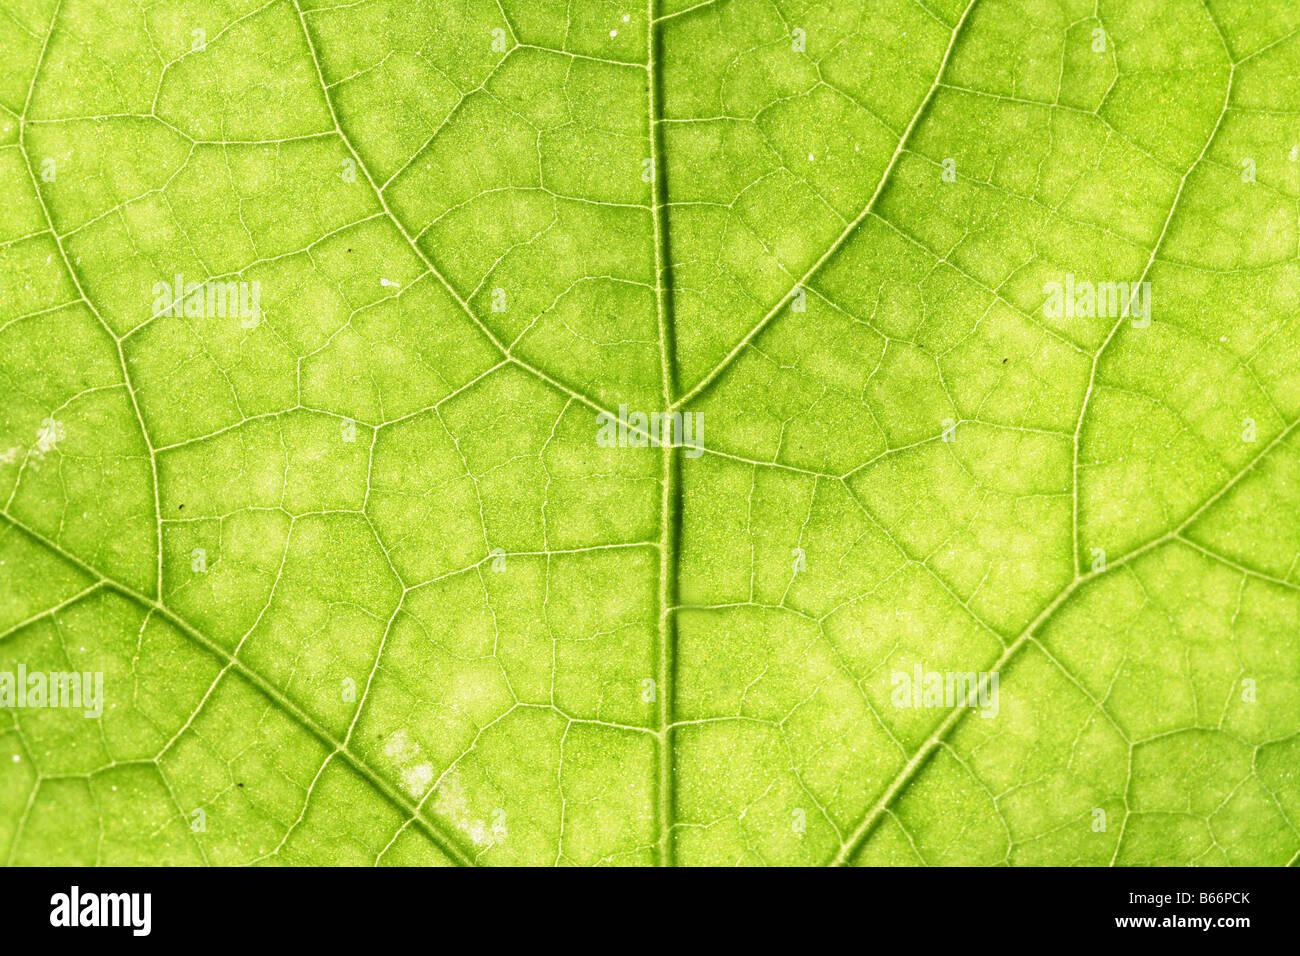 Green leaf veins - Stock Image